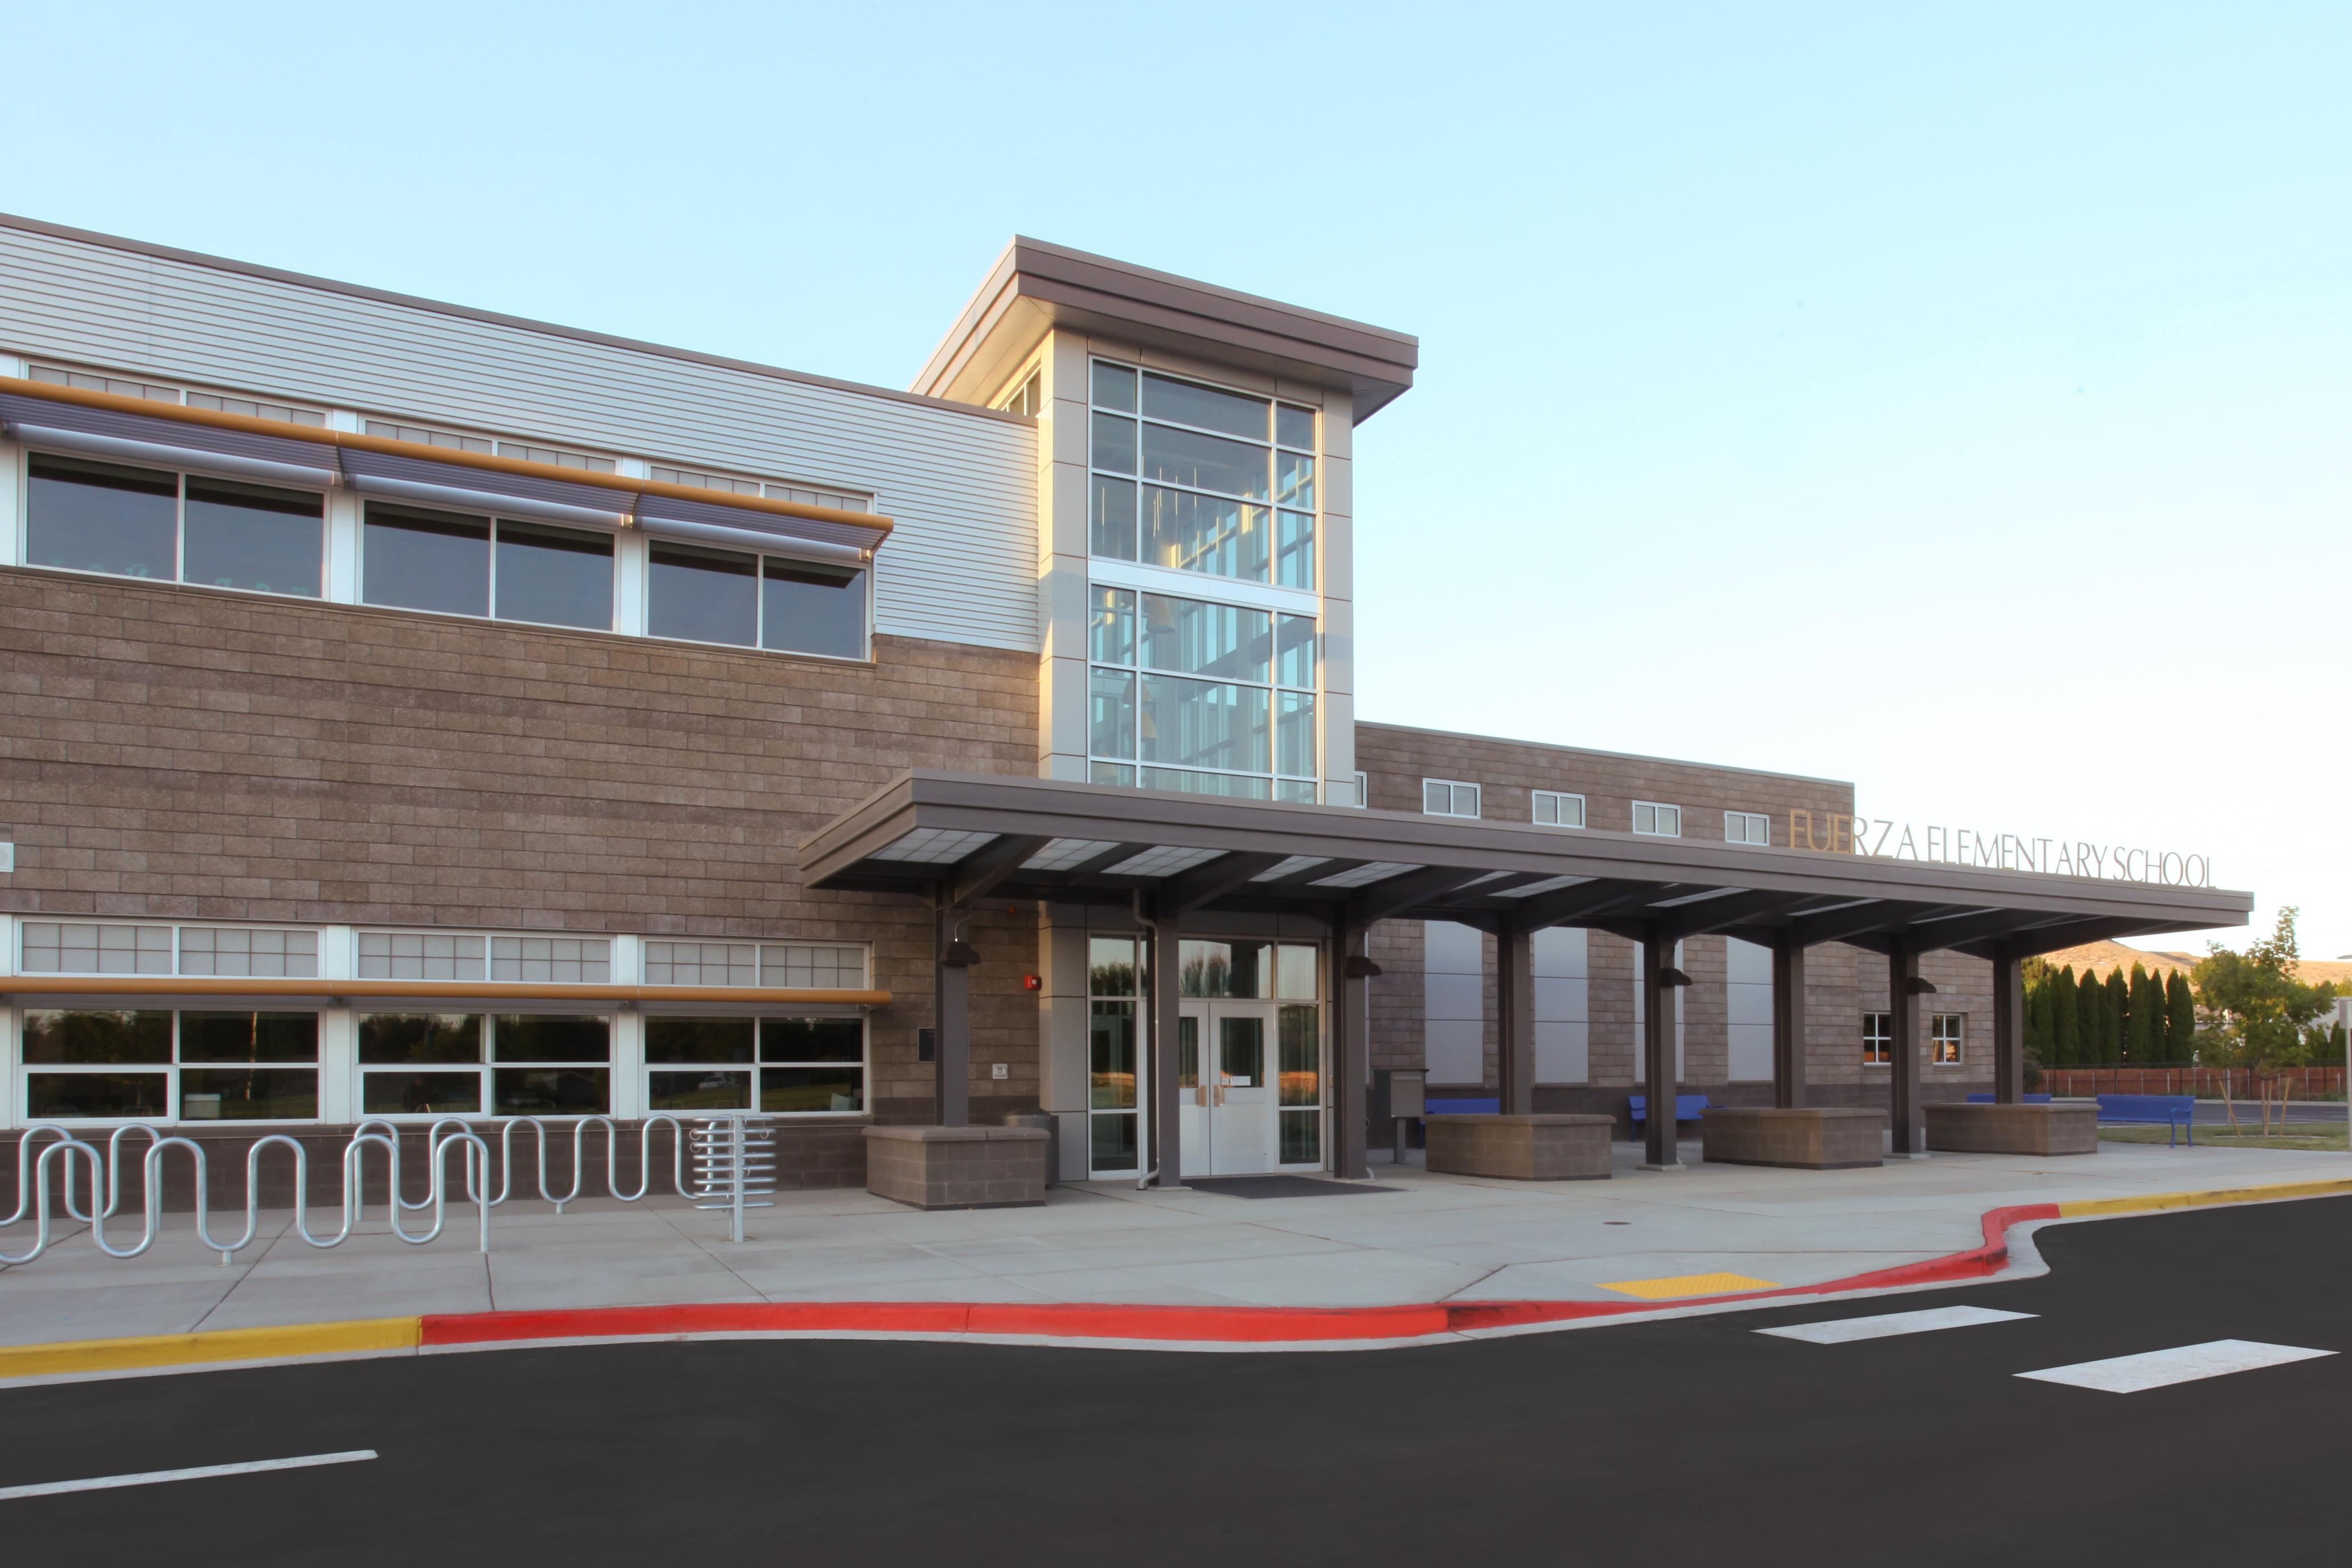 Fuerza Elementary School